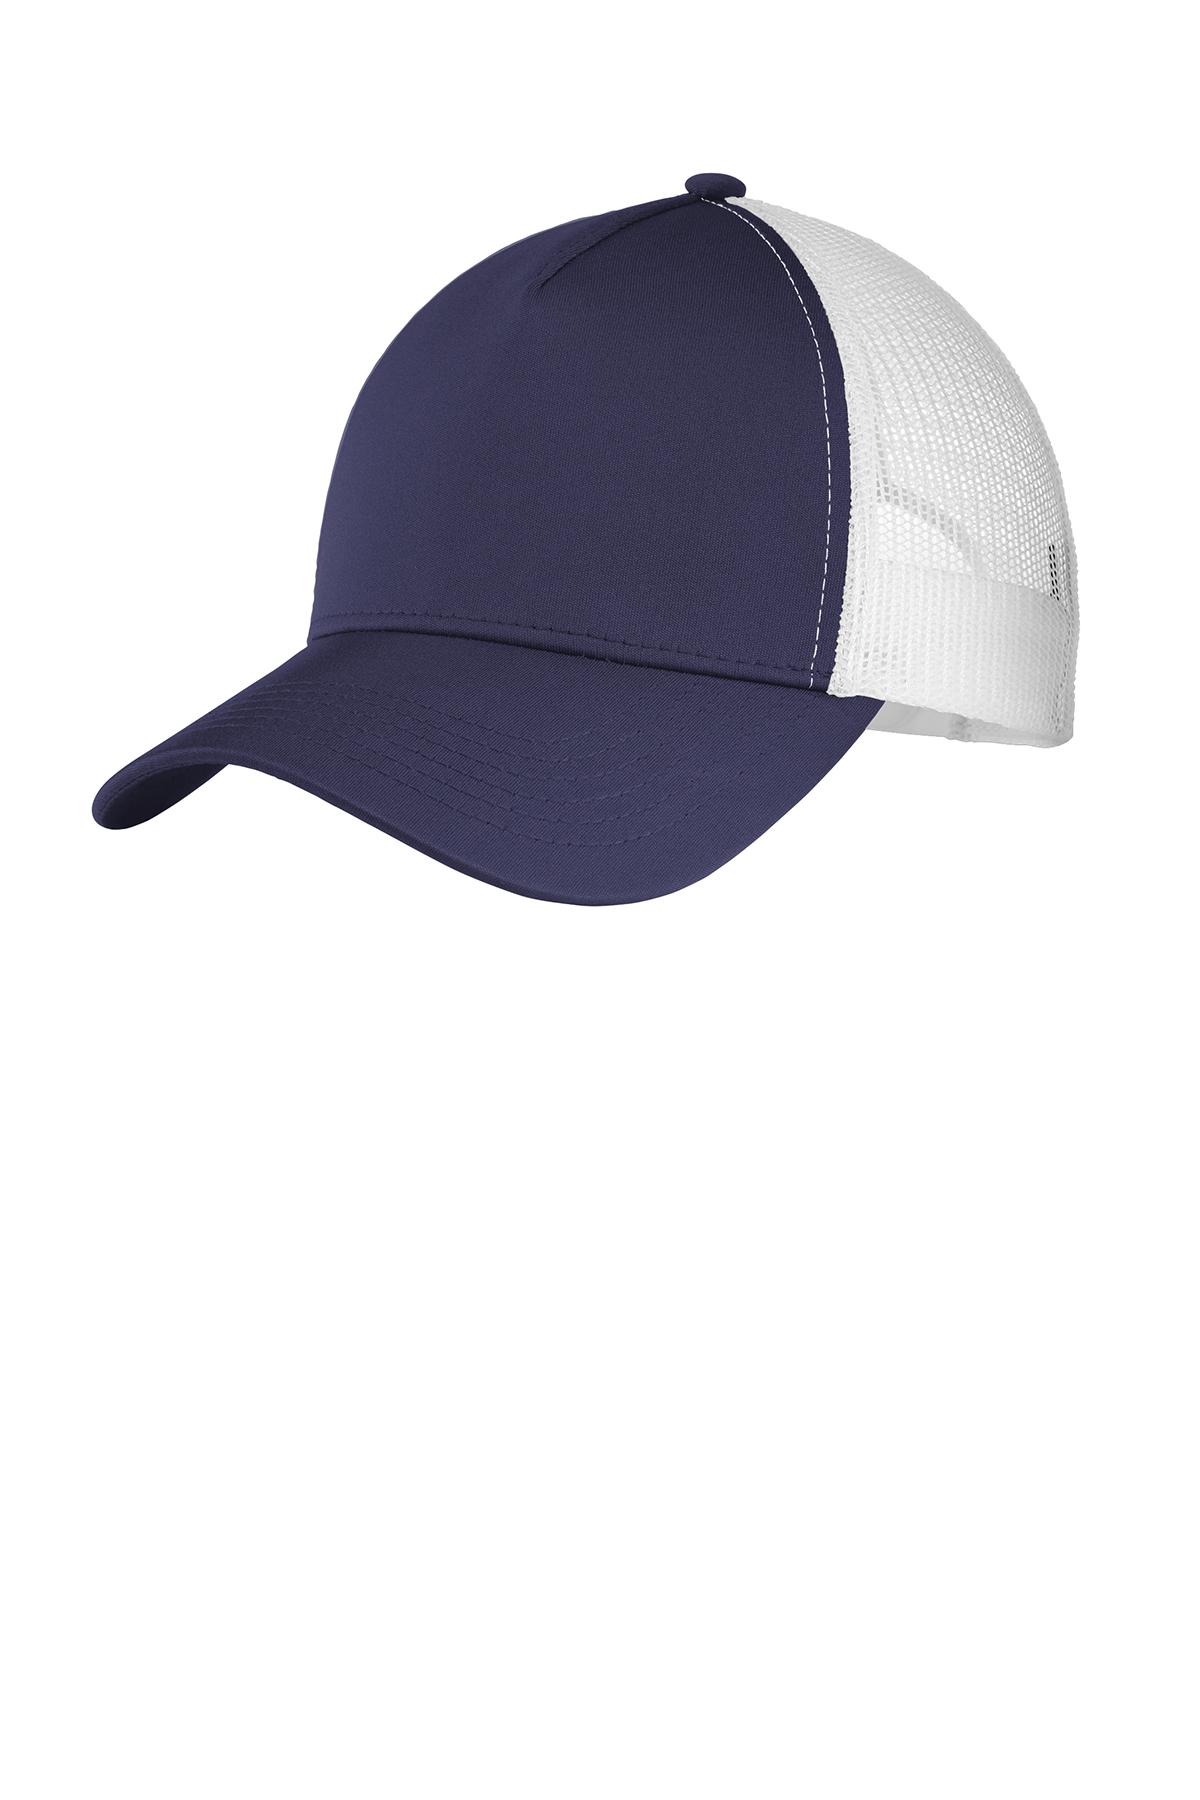 Sport-Tek STC36 - PosiCharge Competitor Mesh Back Cap